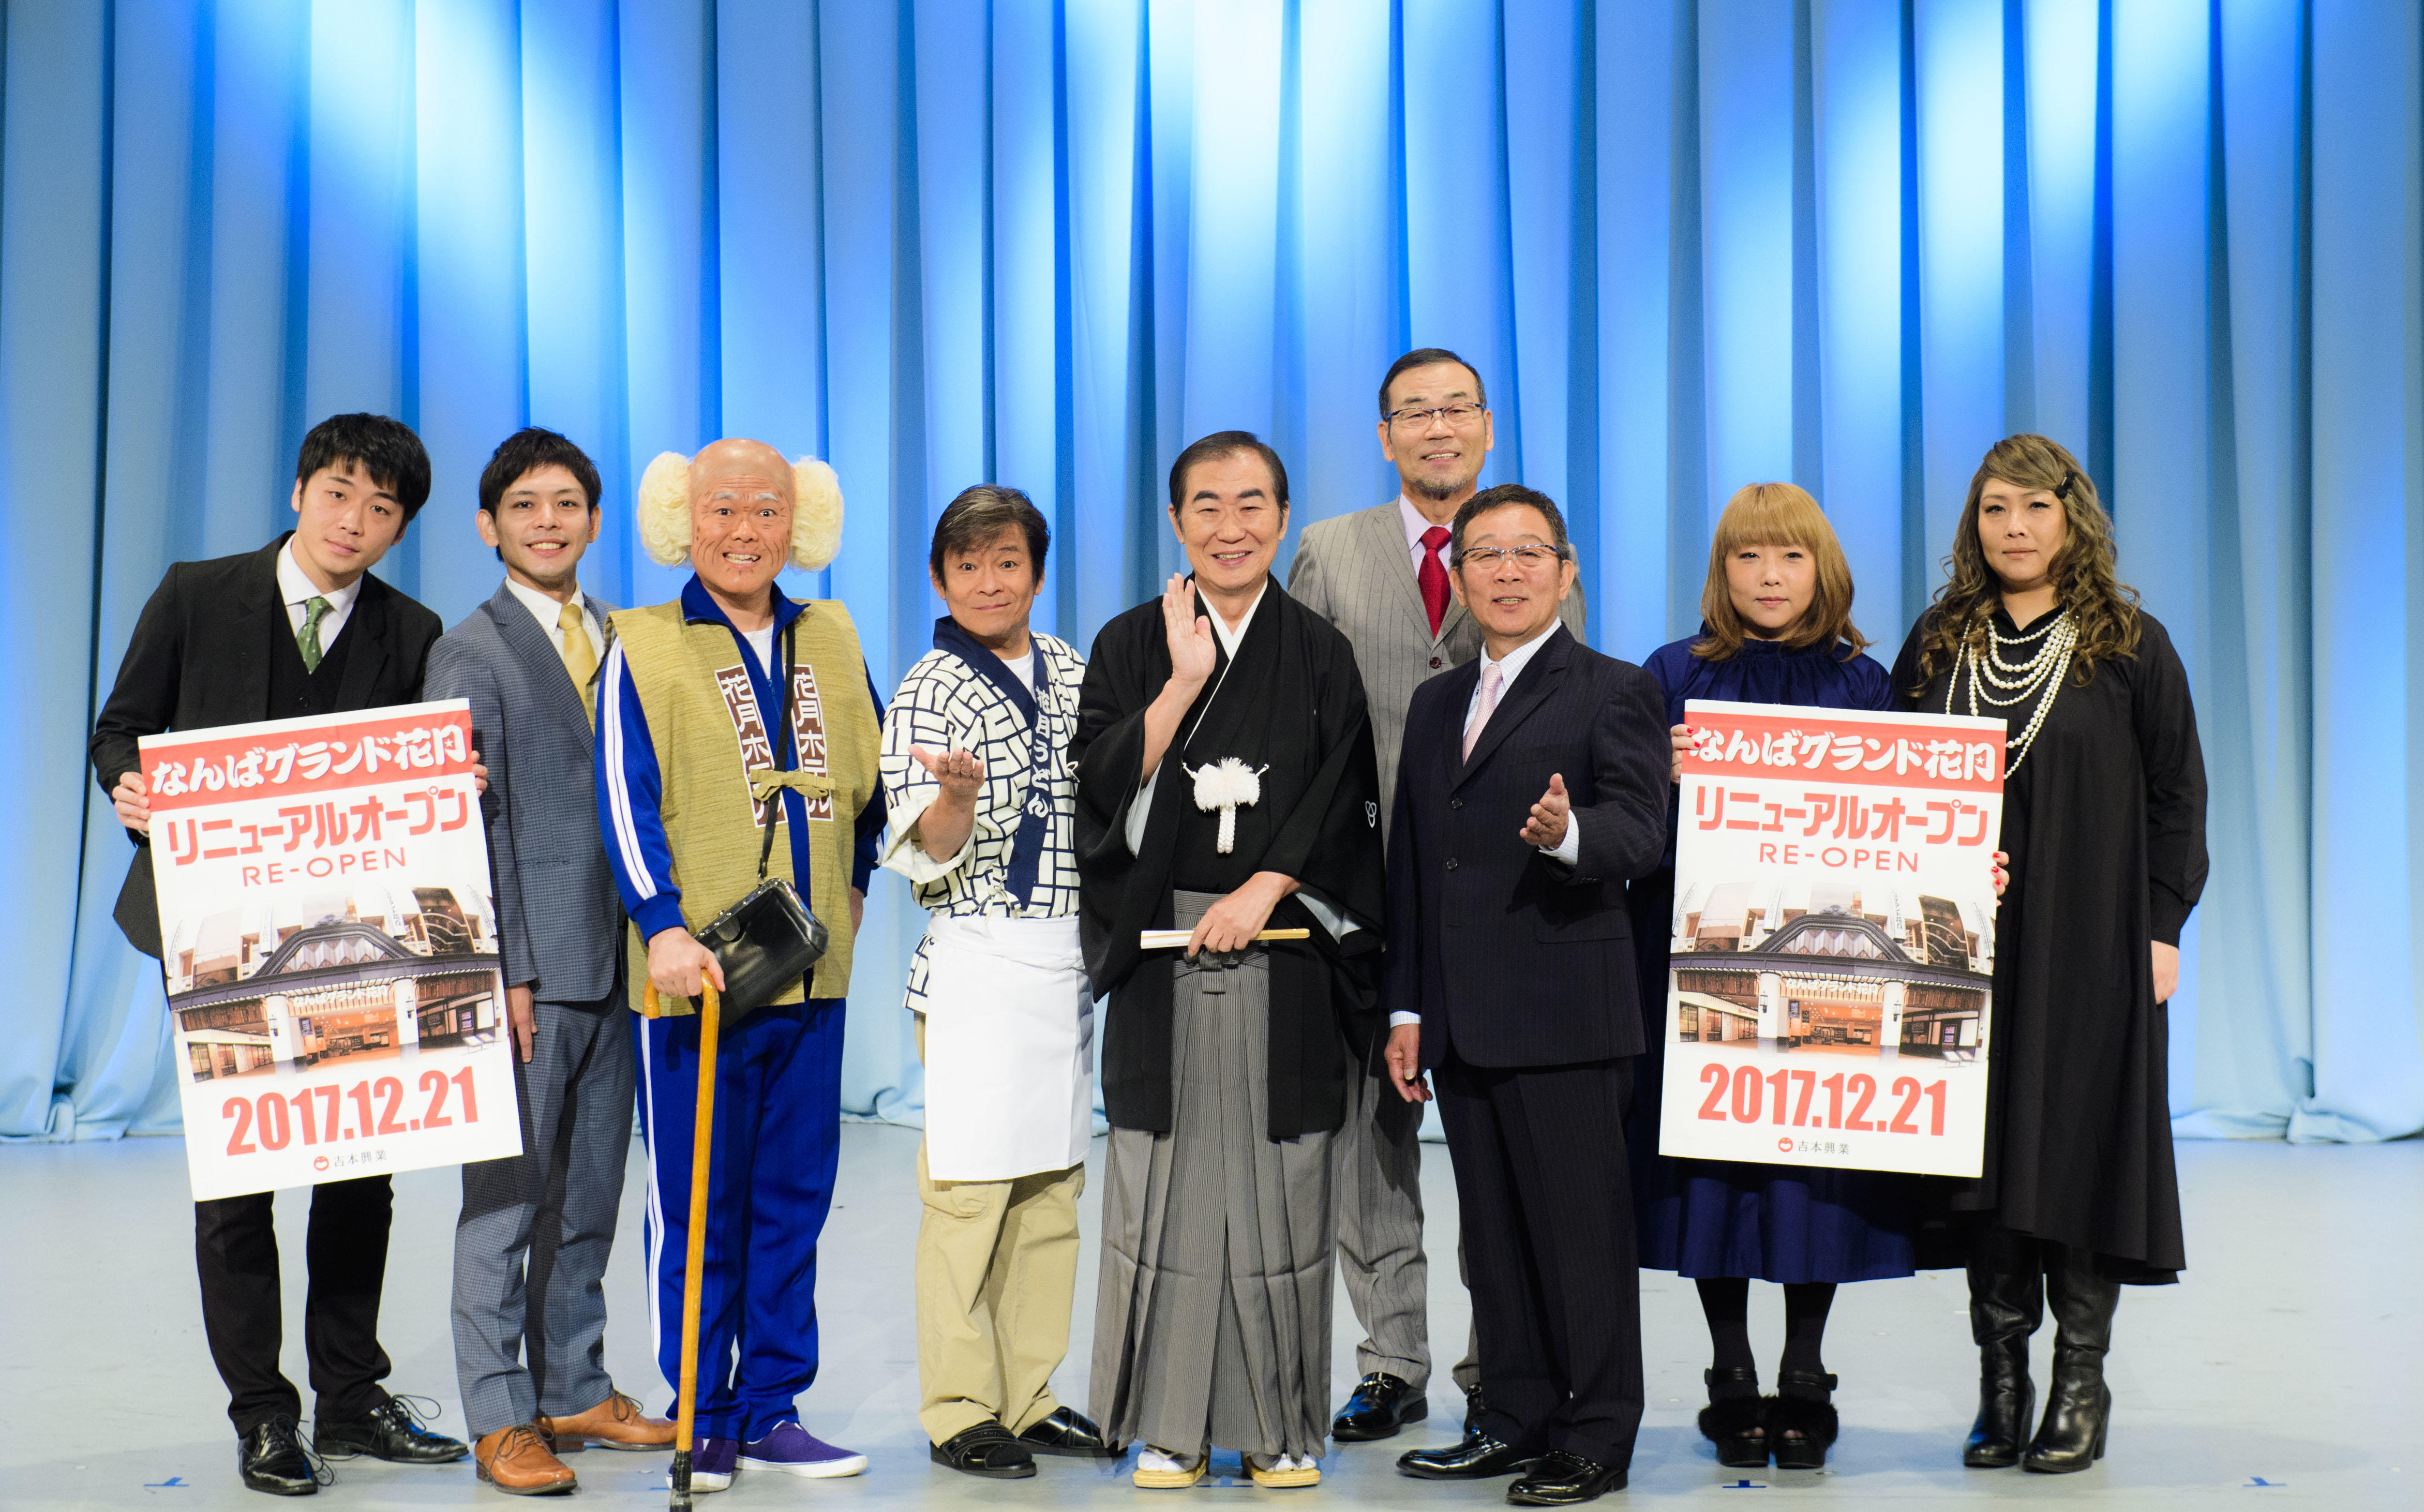 http://news.yoshimoto.co.jp/20171207223600-0afdfa5f23201d86ca0c9c5037f775415f167a5a.jpg